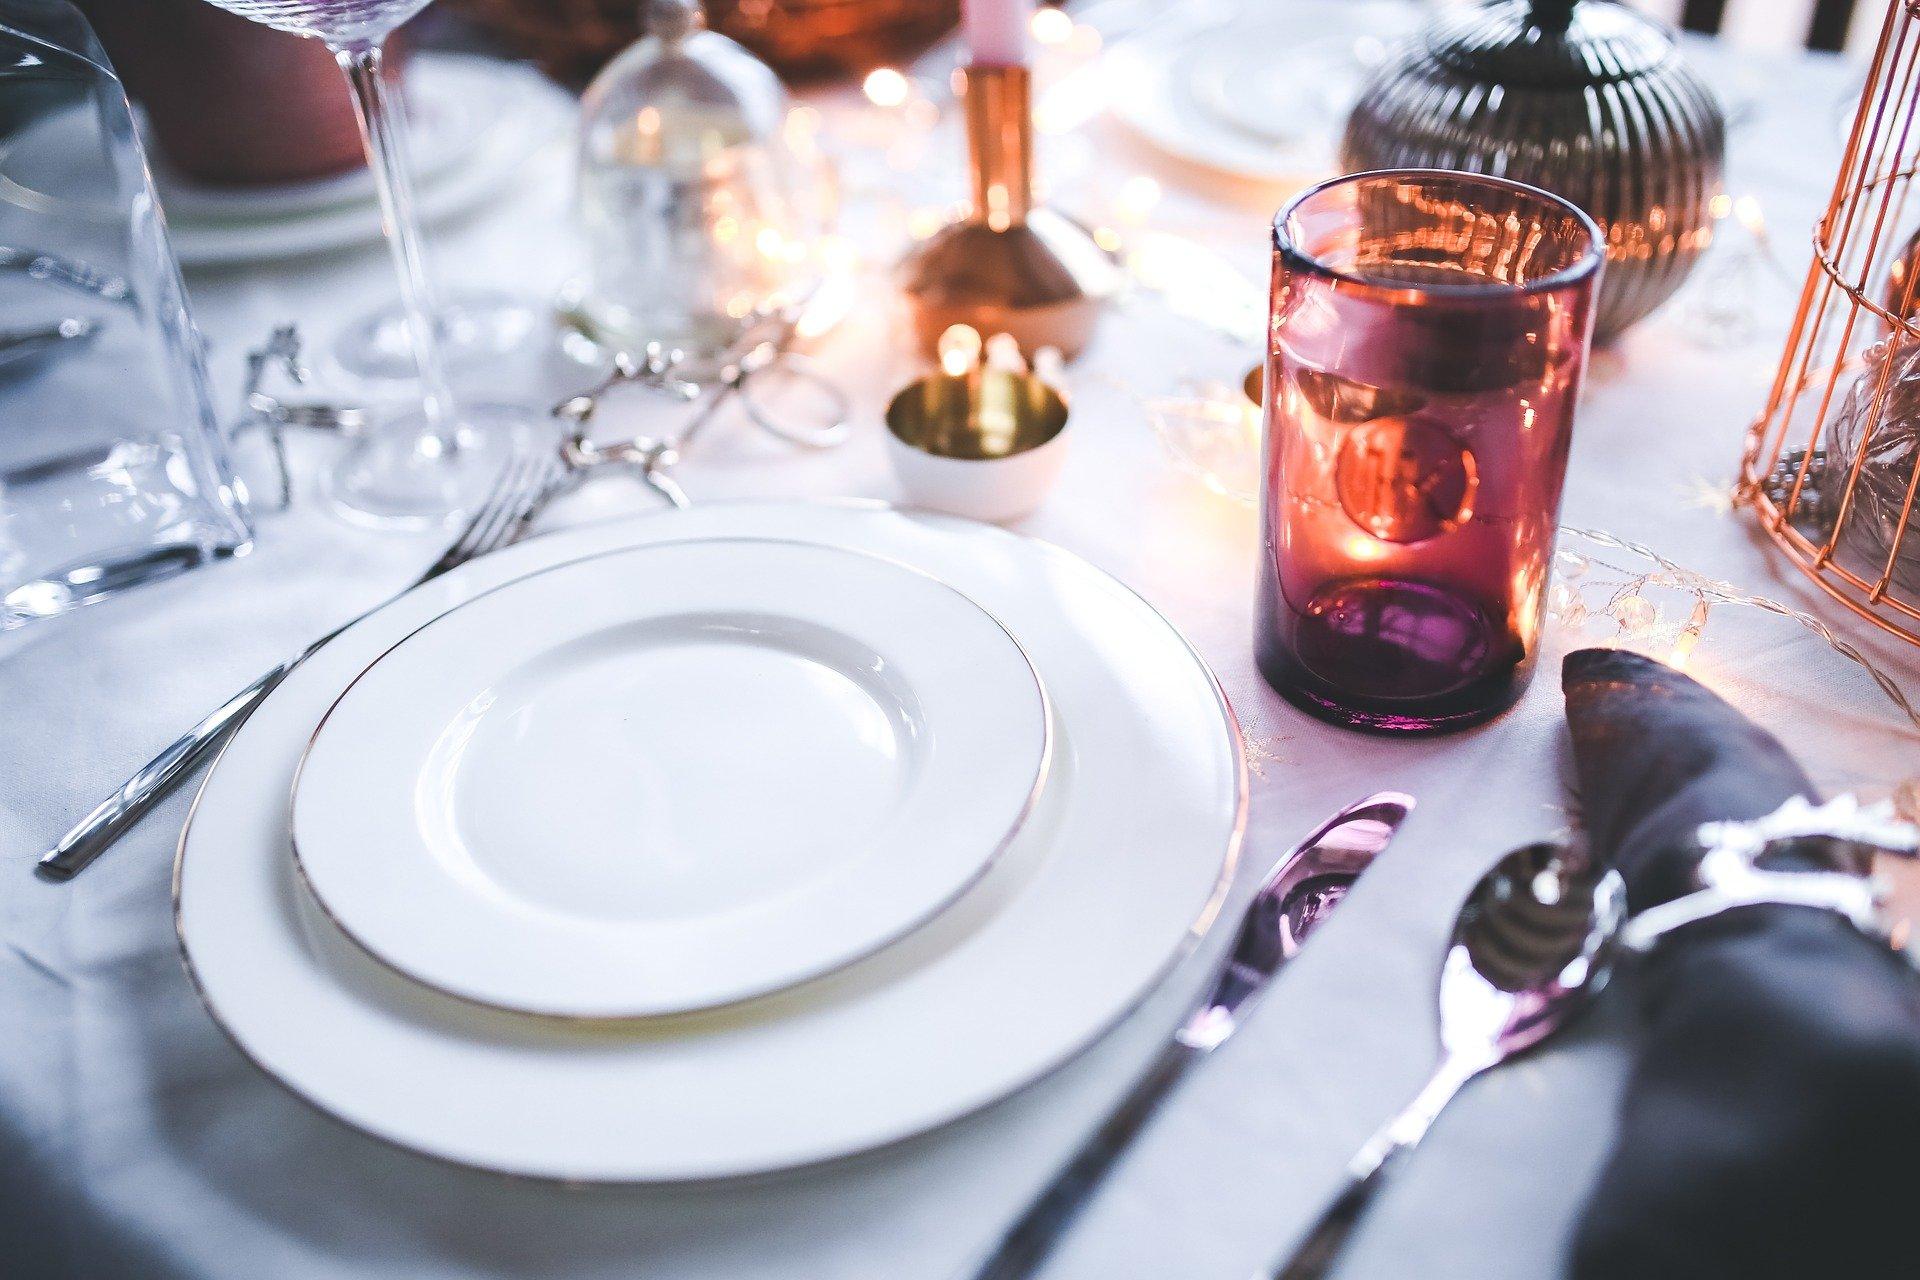 Table de restaurant dressée-Koopr-Karolina-Grabowska